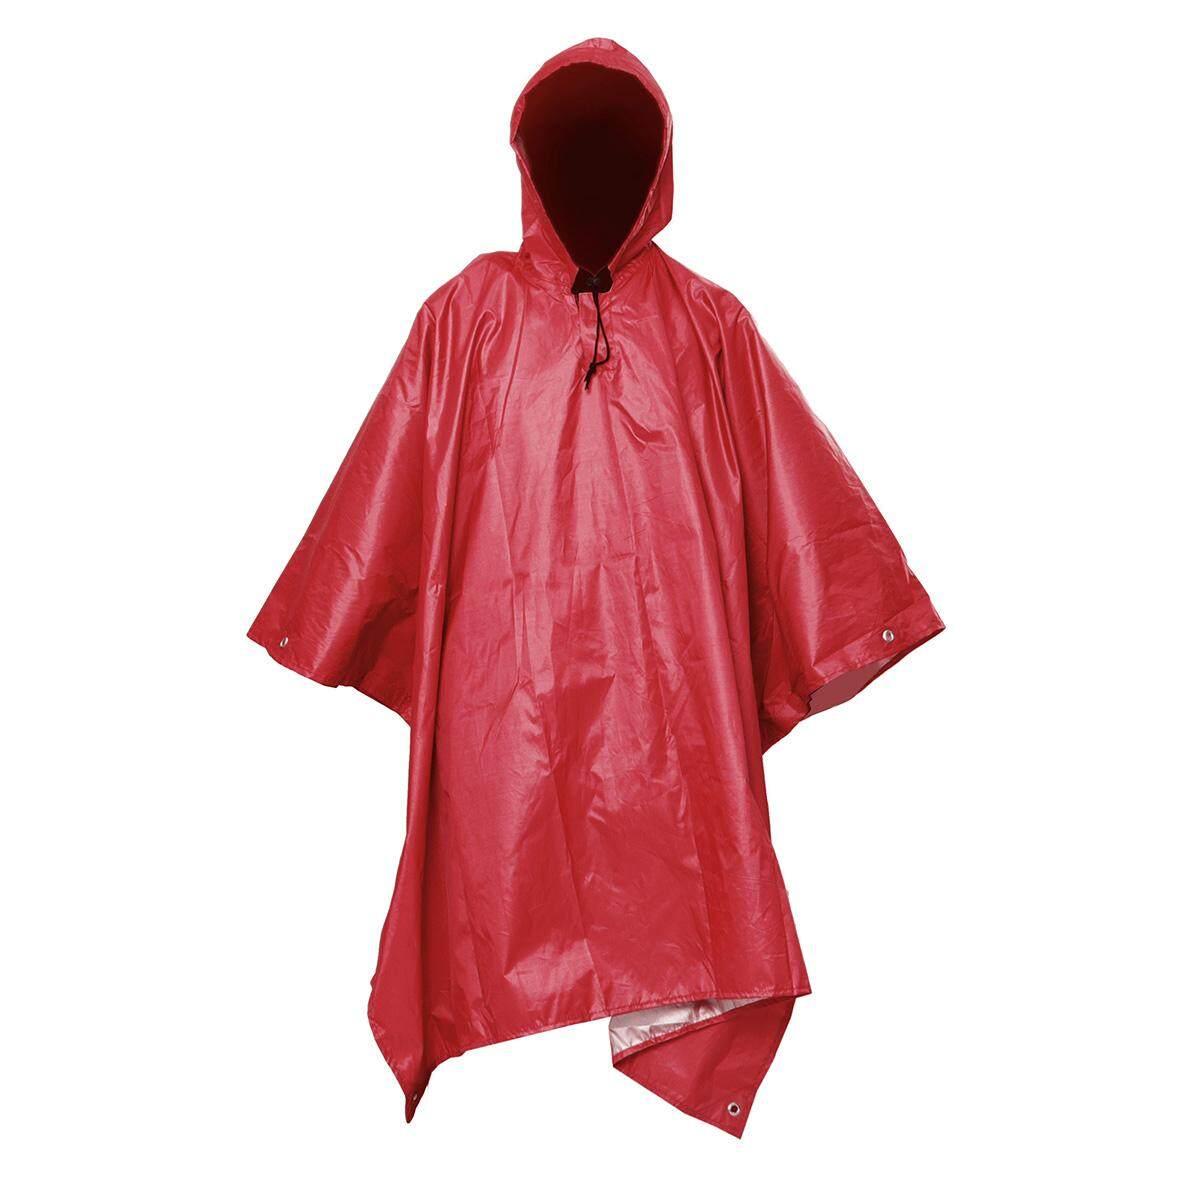 Sleeping Bags Energetic 3 In 1 Multifunctional Raincoat Outdoor Travel Rain Poncho Rain Cover Waterproof Tent Awning Camping Hiking Sleeping Bag Matching In Colour Camp Sleeping Gear